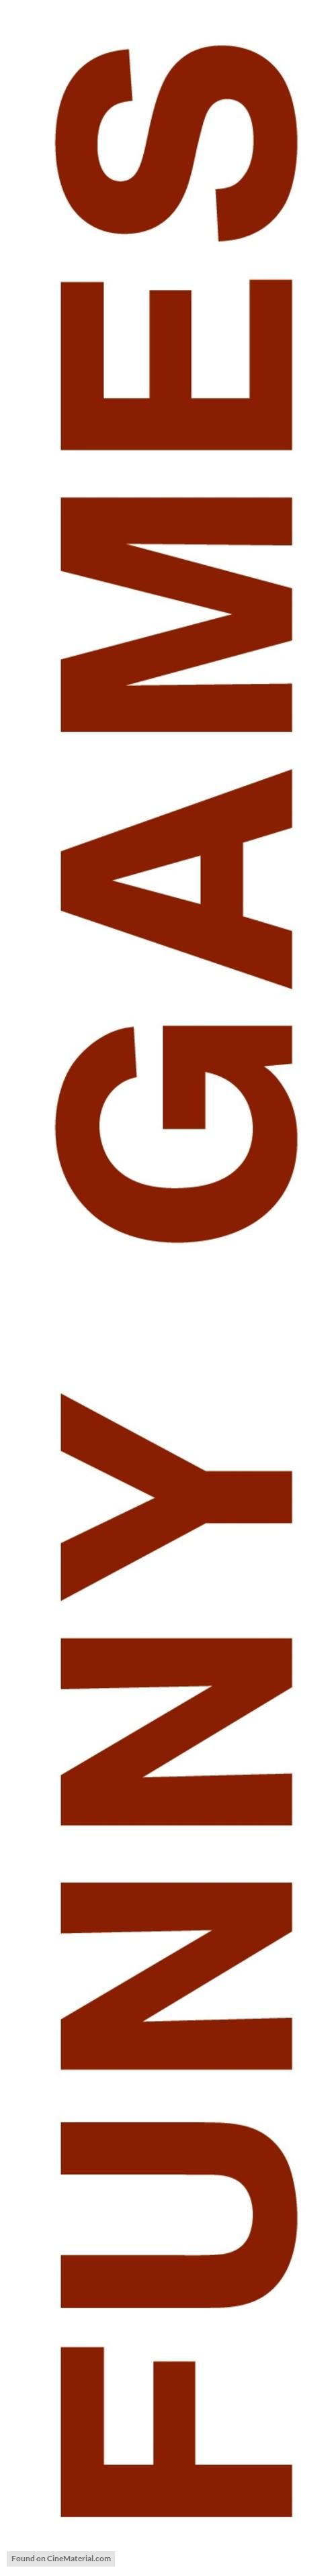 Funny Games U.S. - Logo